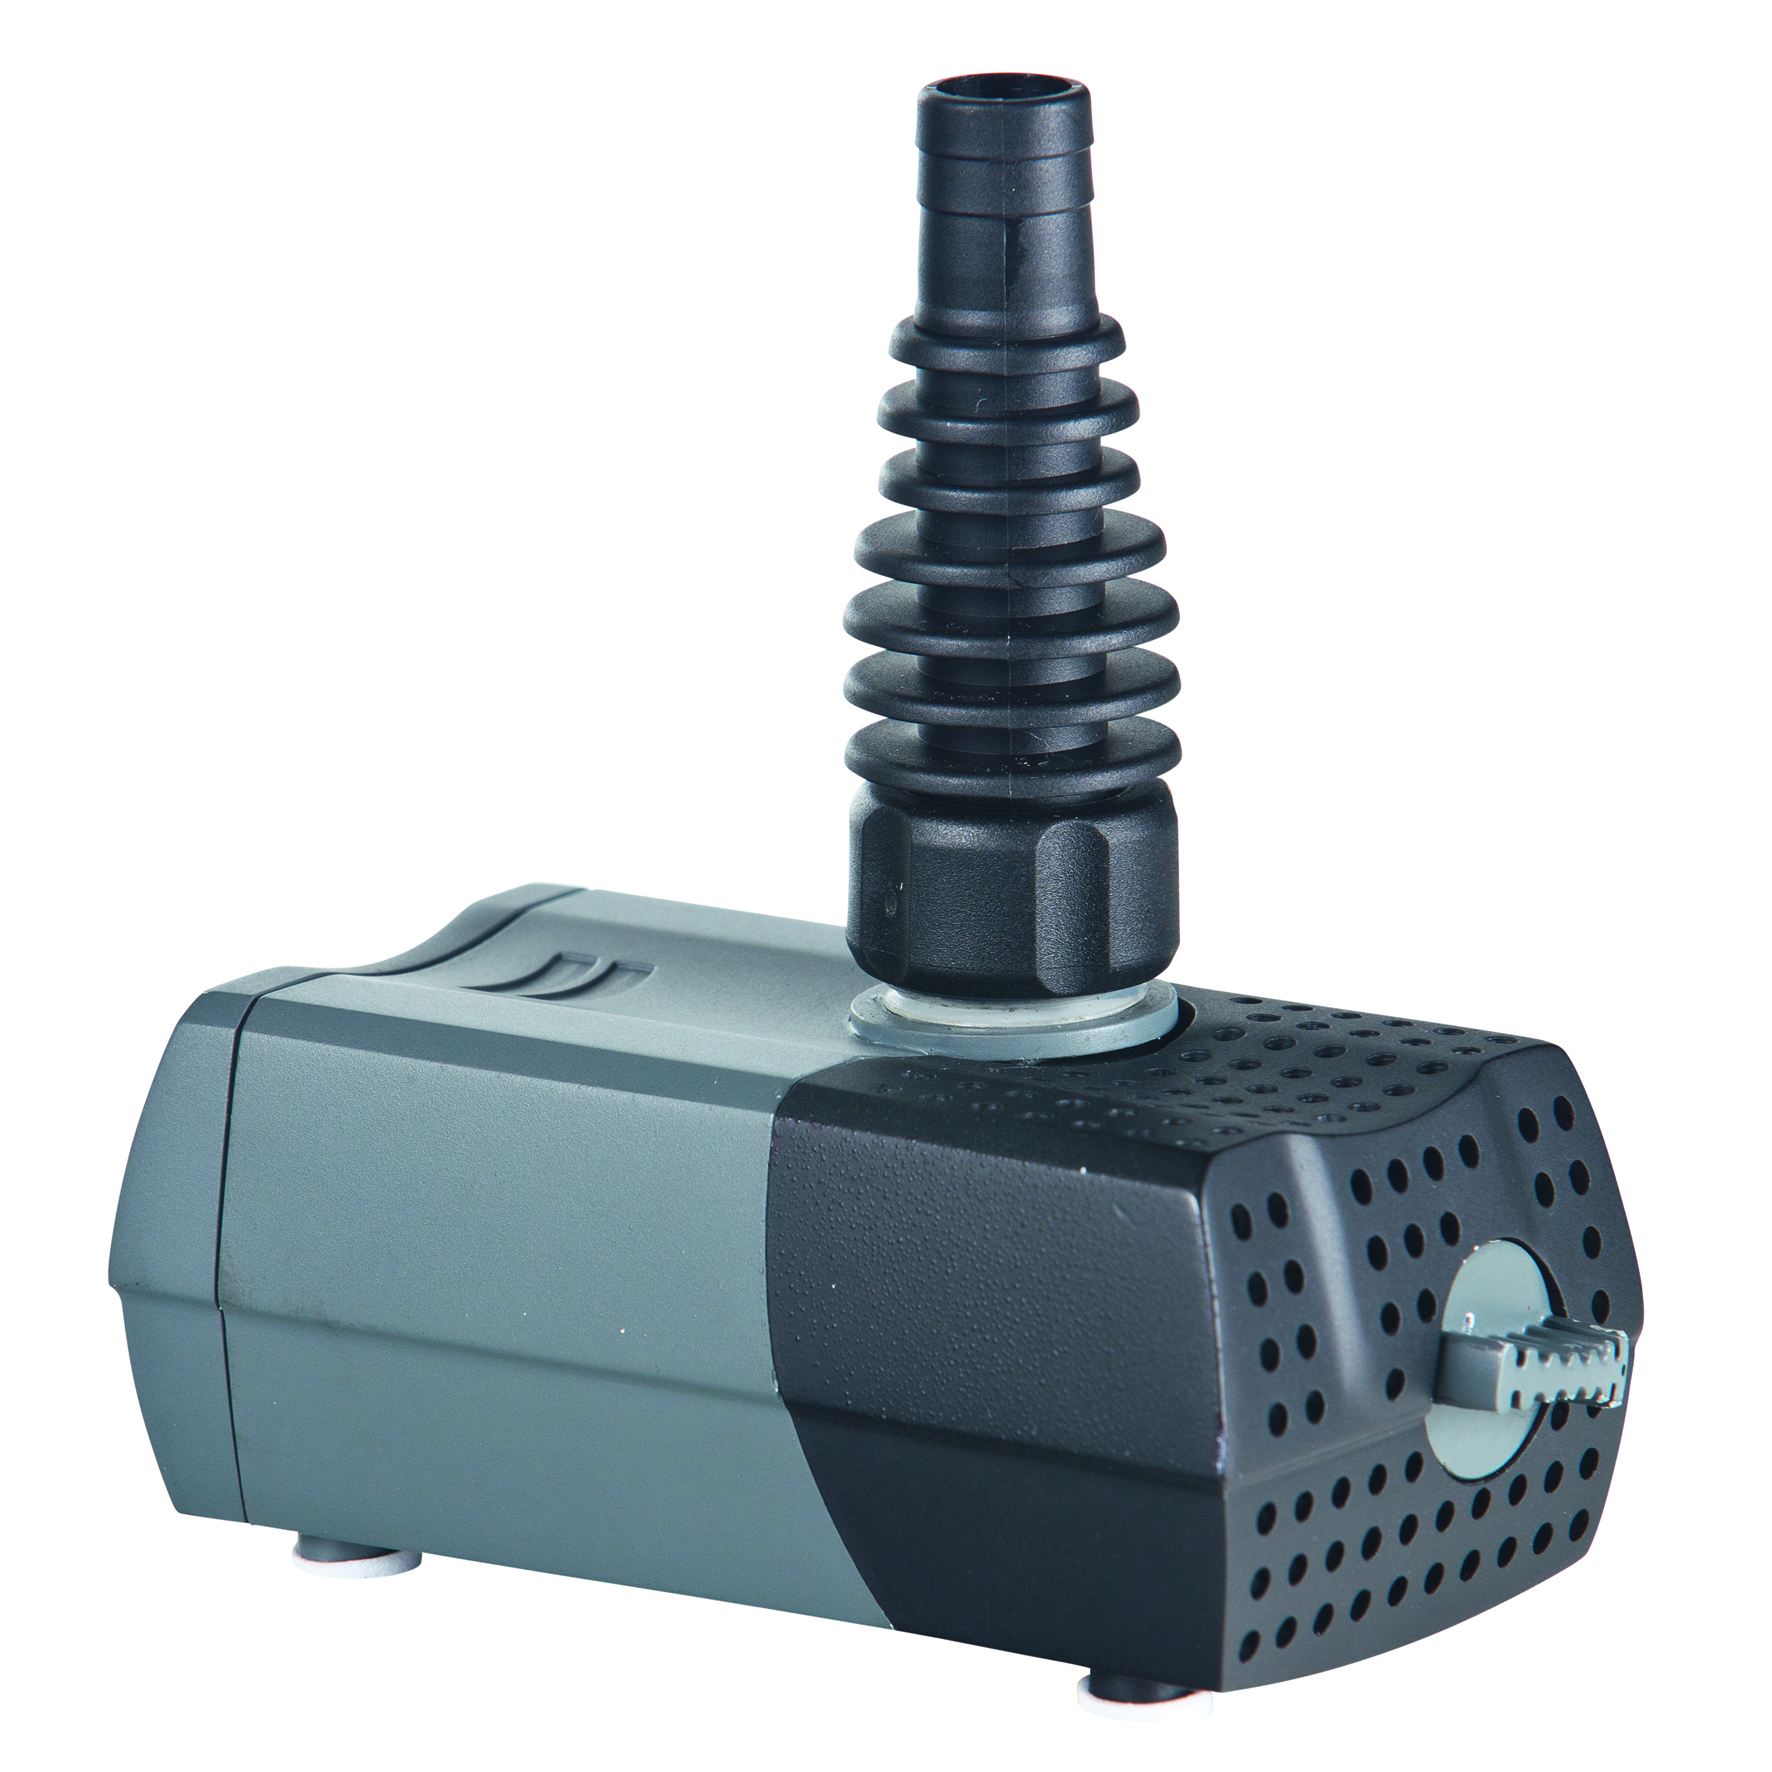 AQUA STARK Multifunktionspumpe 700 l/h